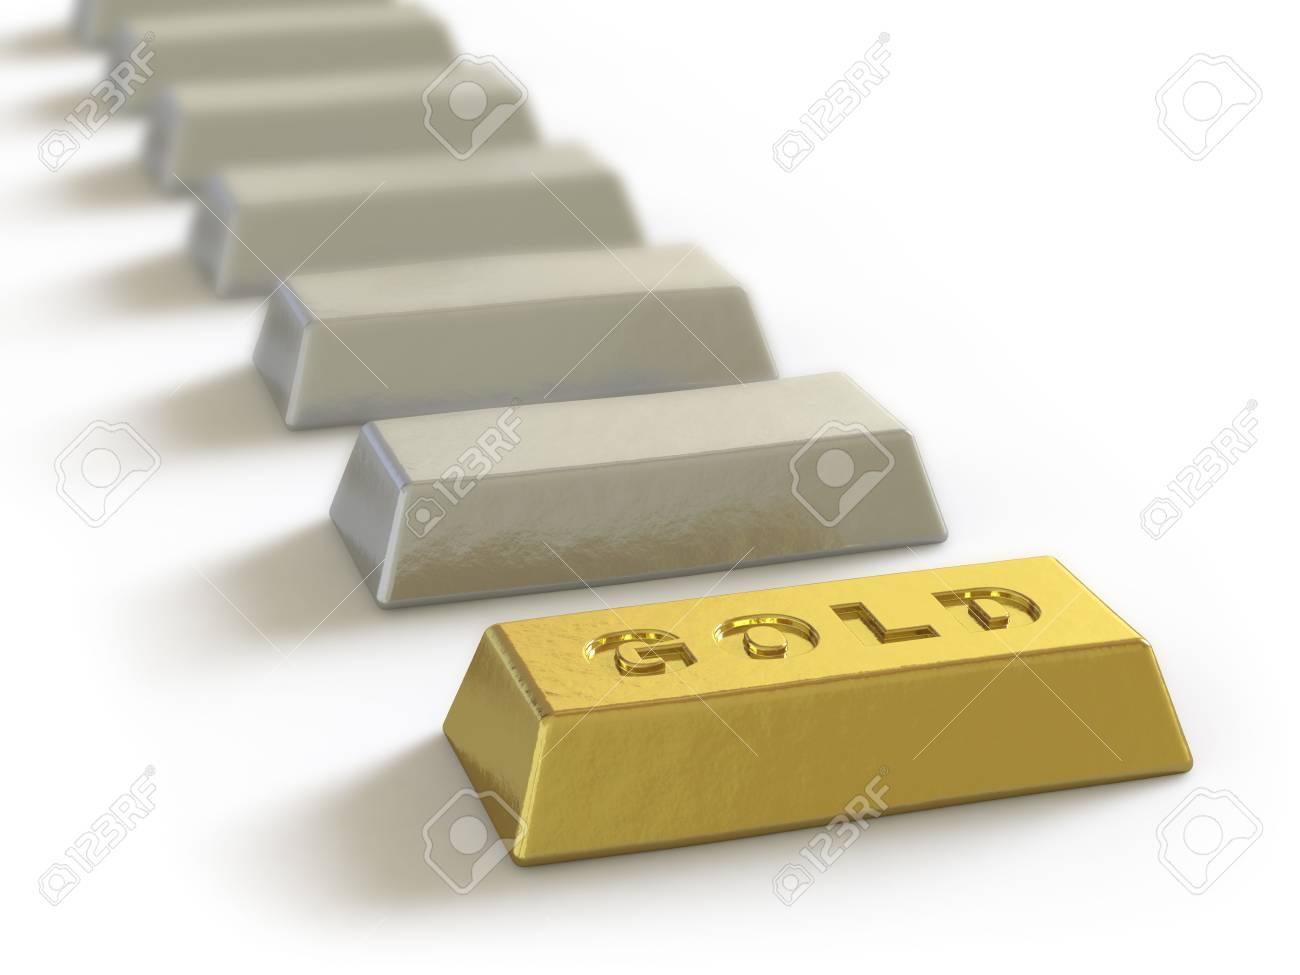 The gold ingot lies on a white surface Stock Photo - 5057969